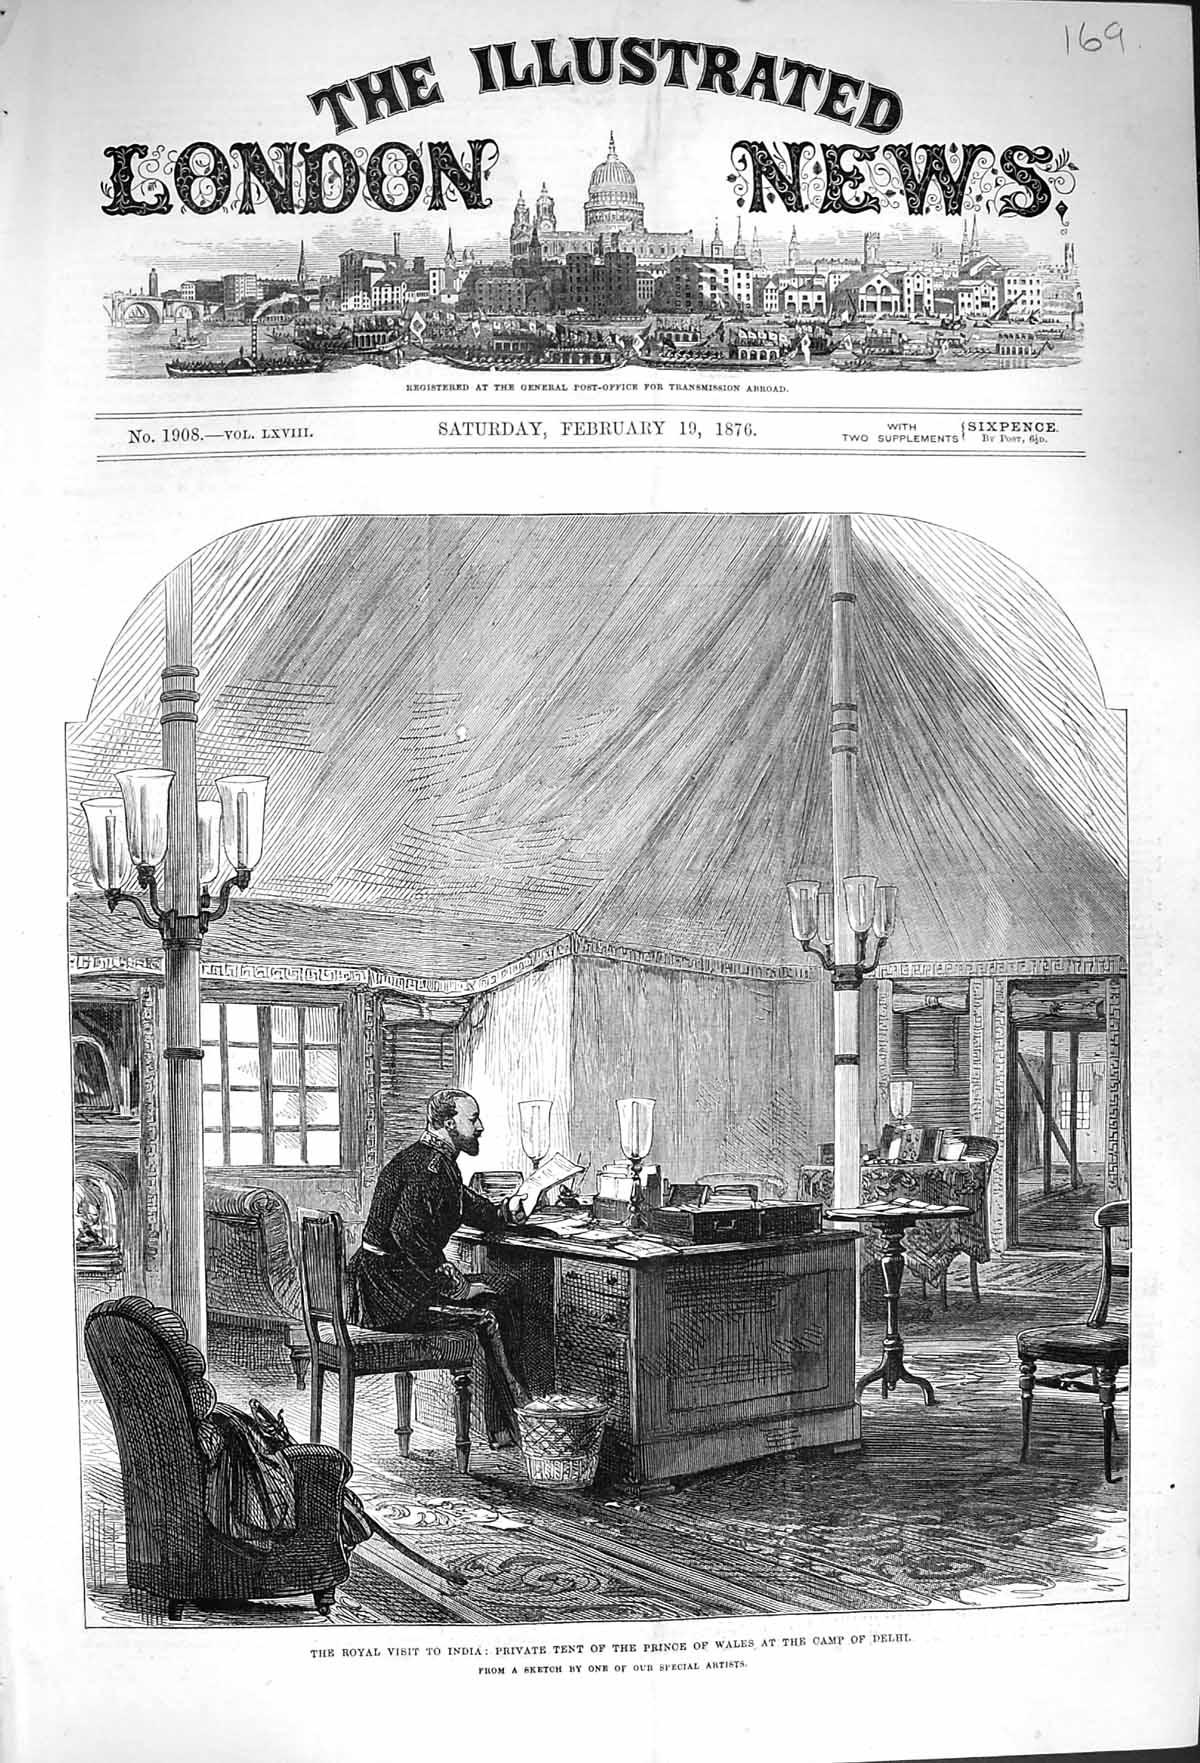 http://www.columbia.edu/itc/mealac/pritchett/00routesdata/1800_1899/britishrule/incountry/iln1876.jpg